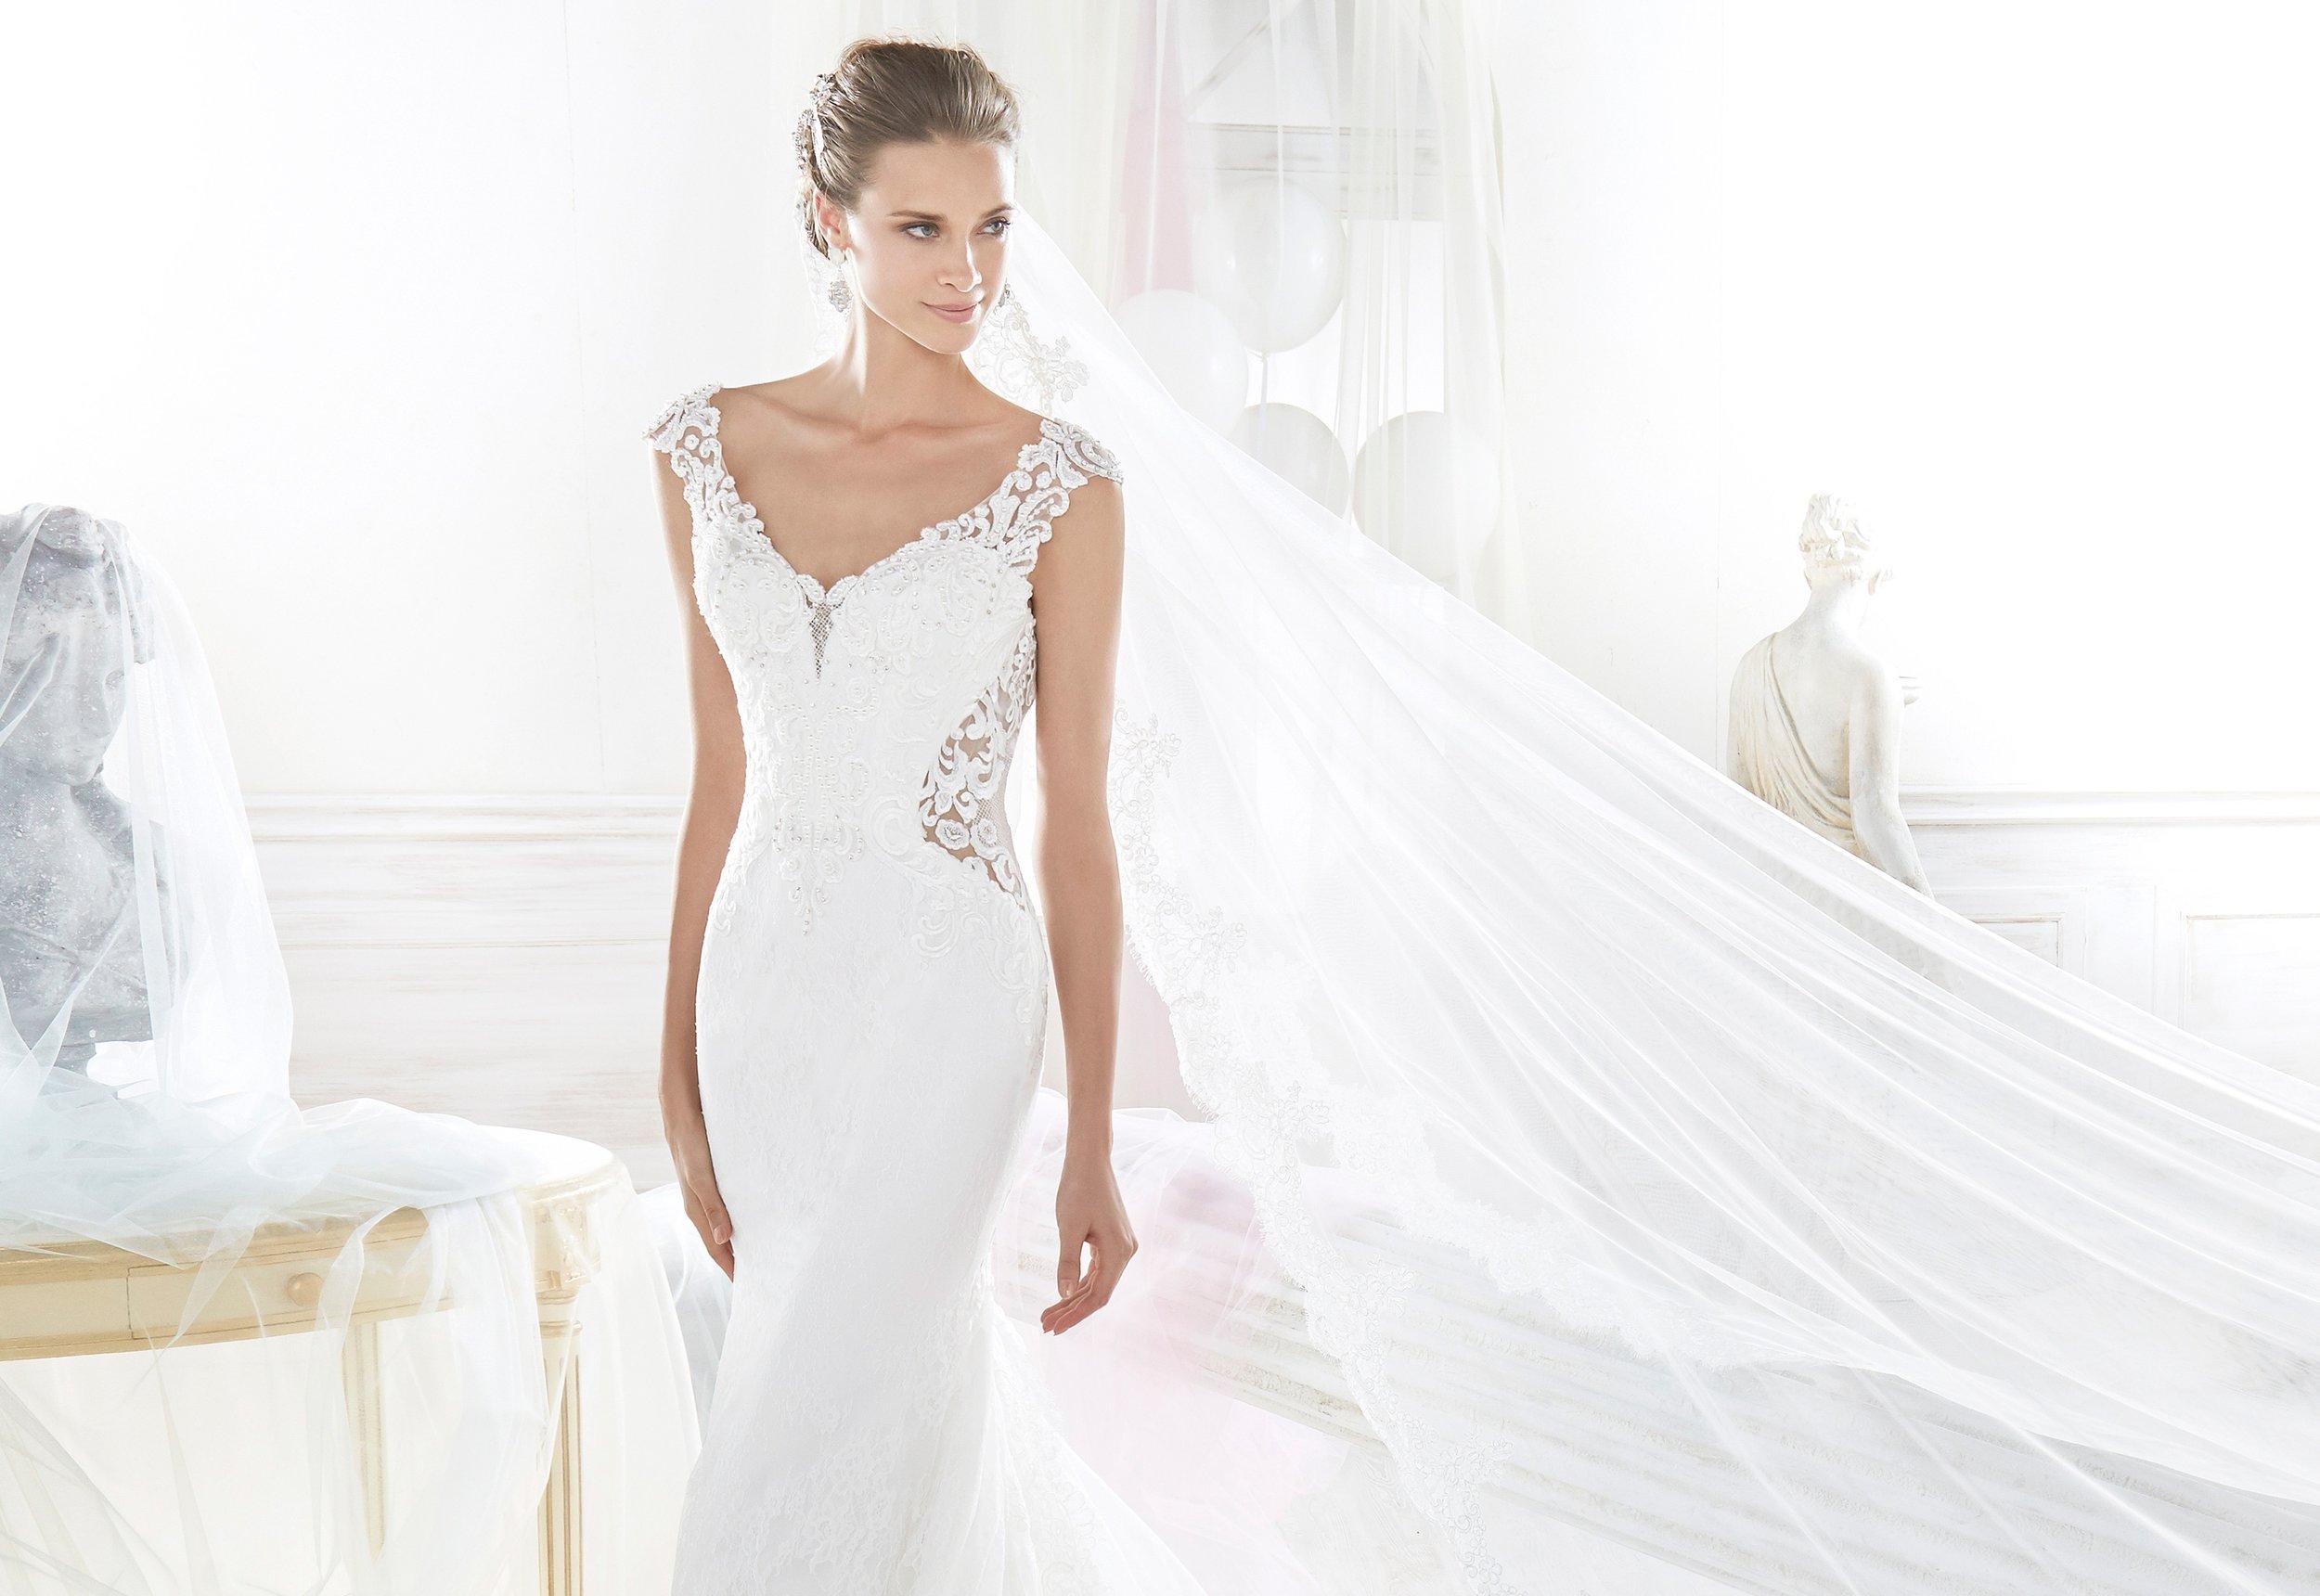 nicole-spose-NIAB18057-Nicole-moda-sposa-2018-66.jpg